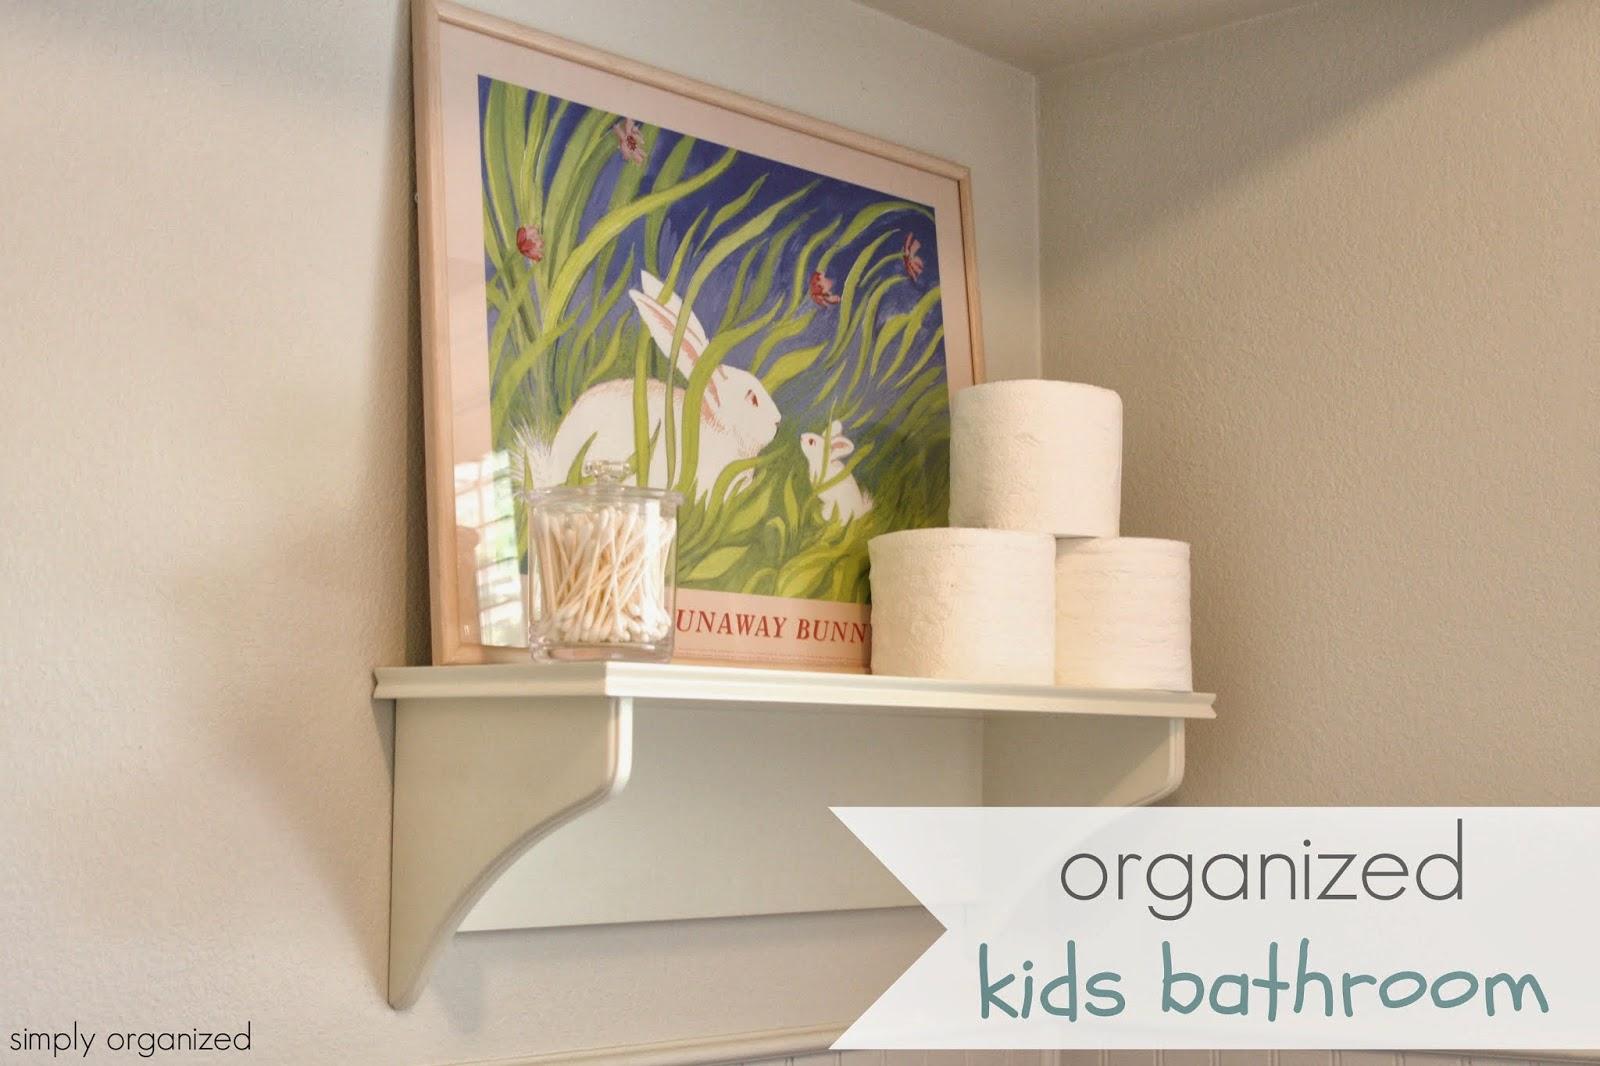 Simply Organized Organized Kids Bathroom